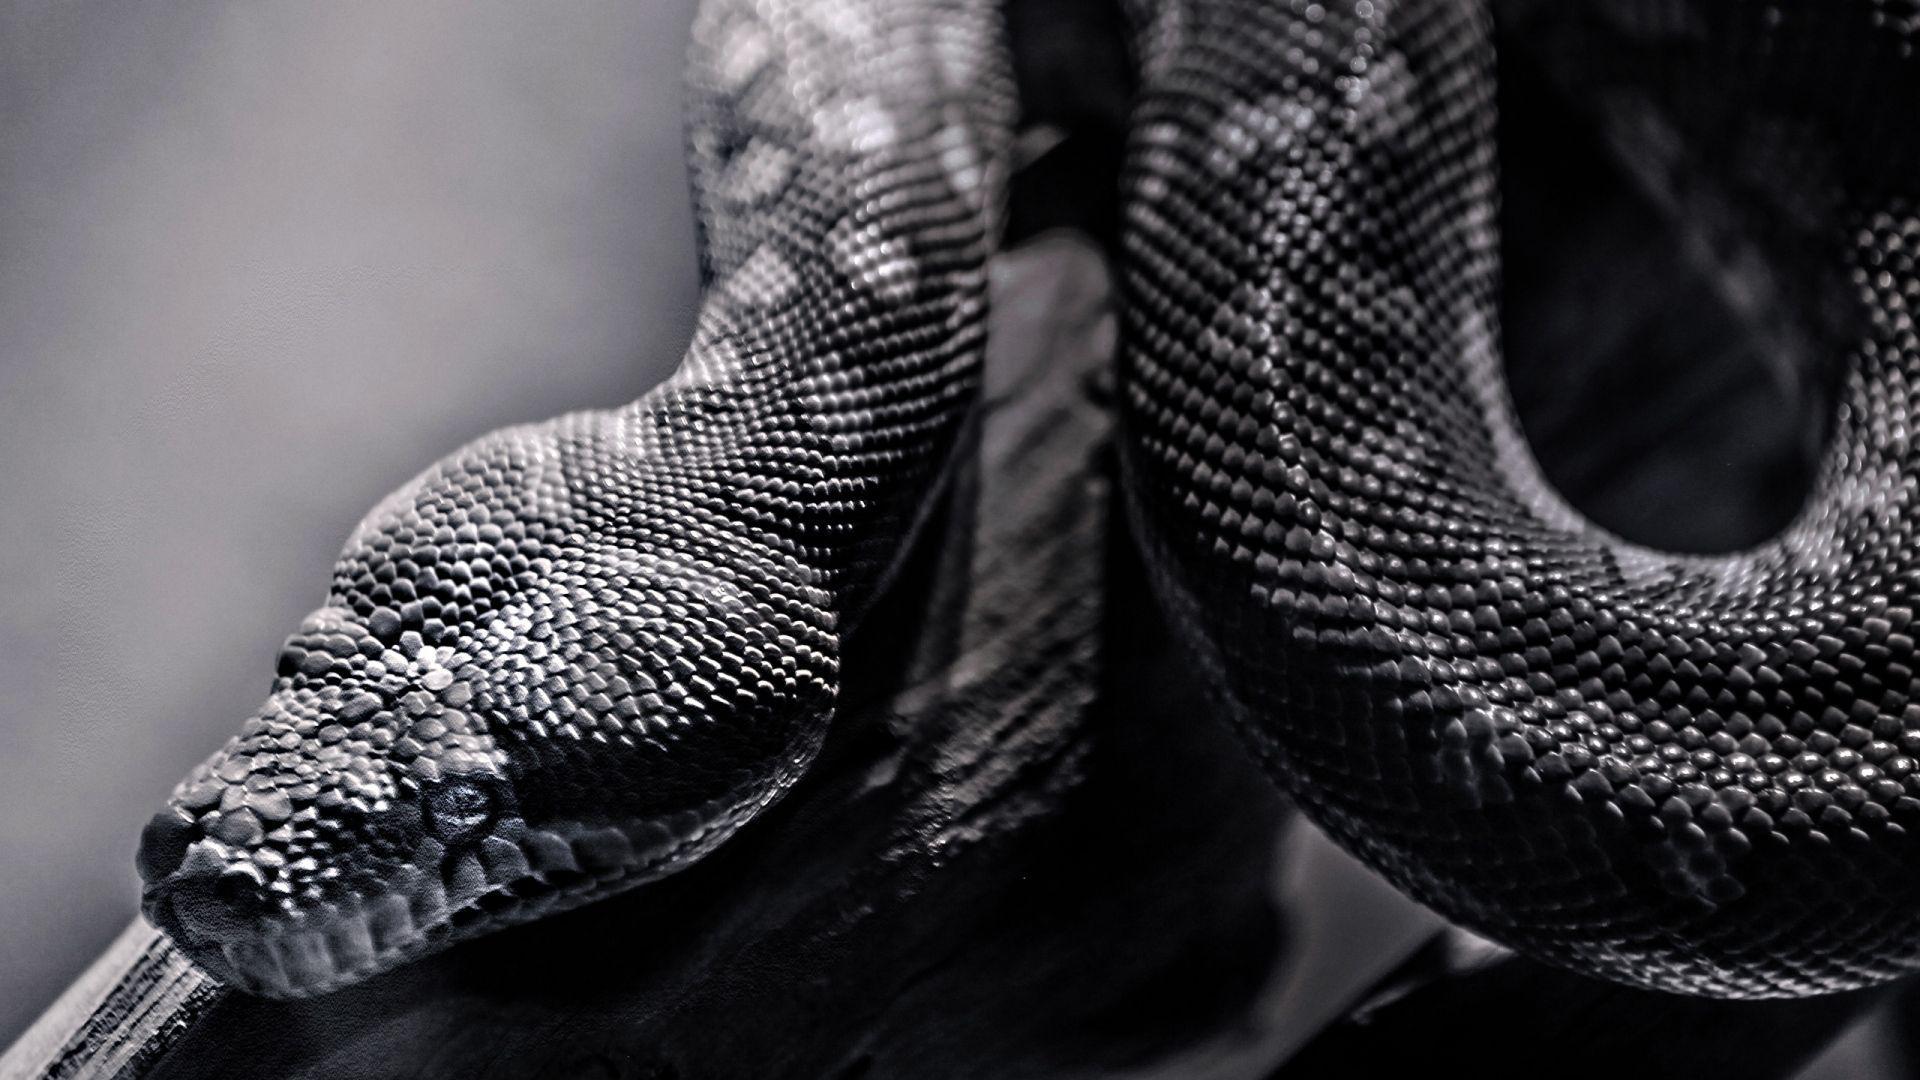 Black Snake Wallpapers Wallpaper Cave